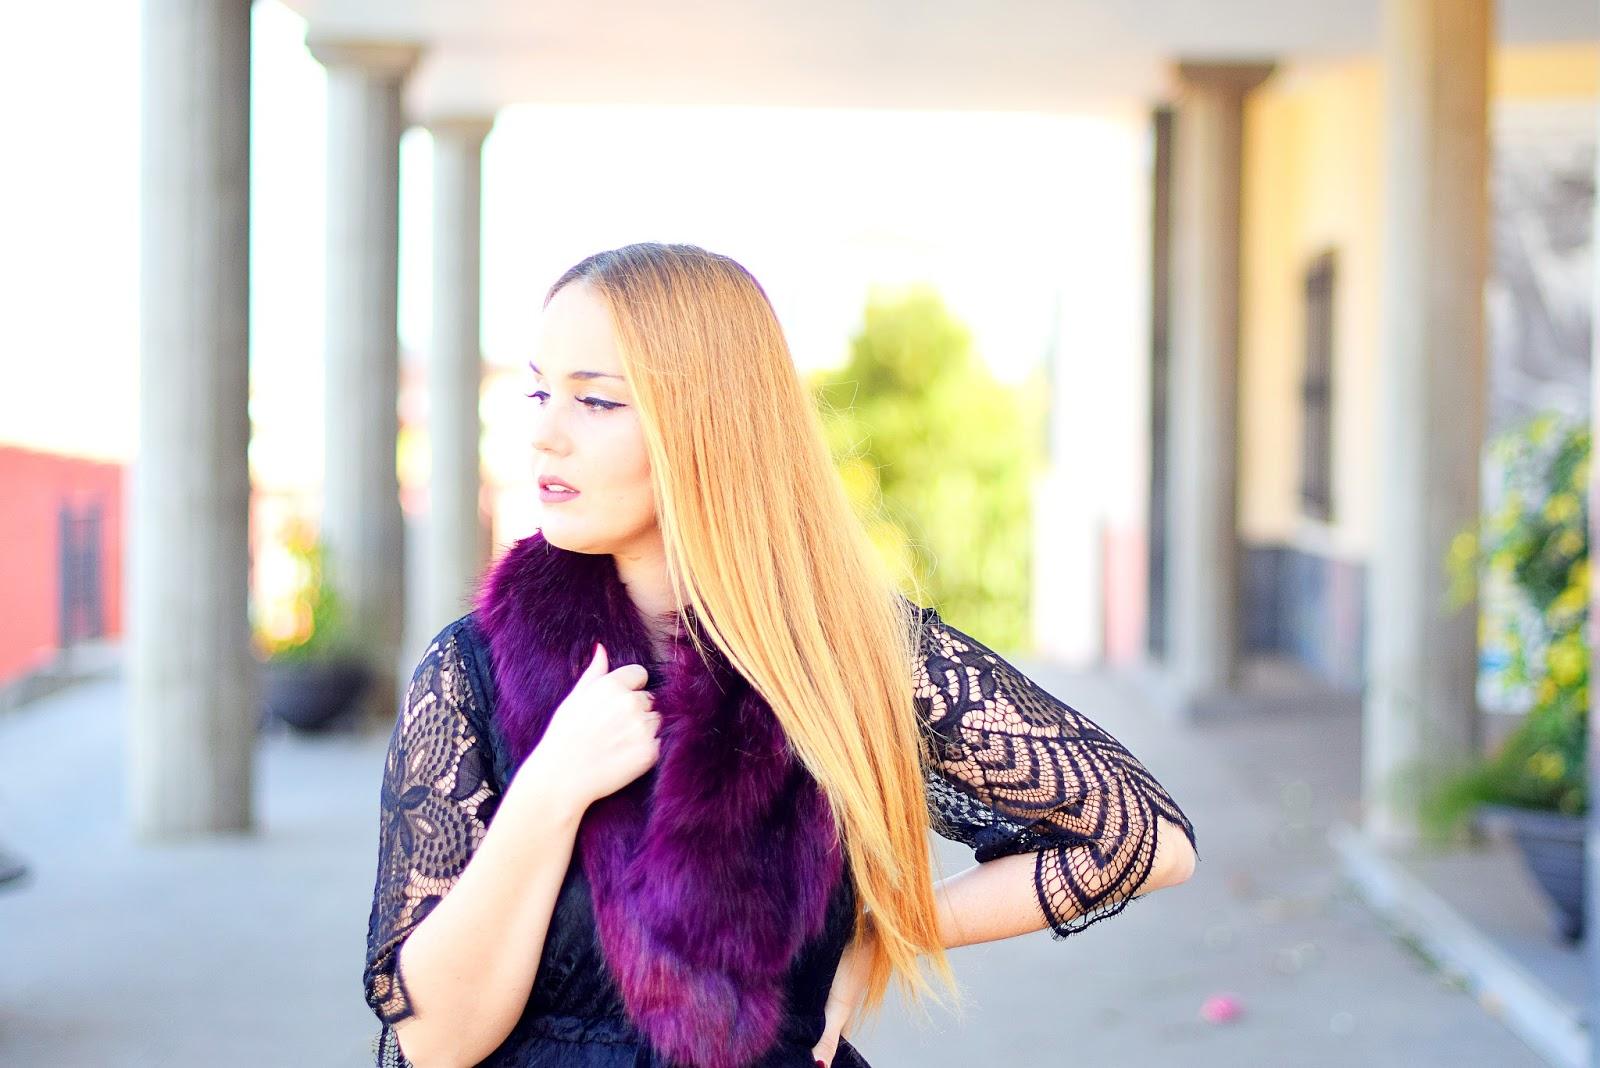 nery hdez, el corte ingles, amiclubwear, vestido negro de encaje, look de fiesta, boa de pelo sintética